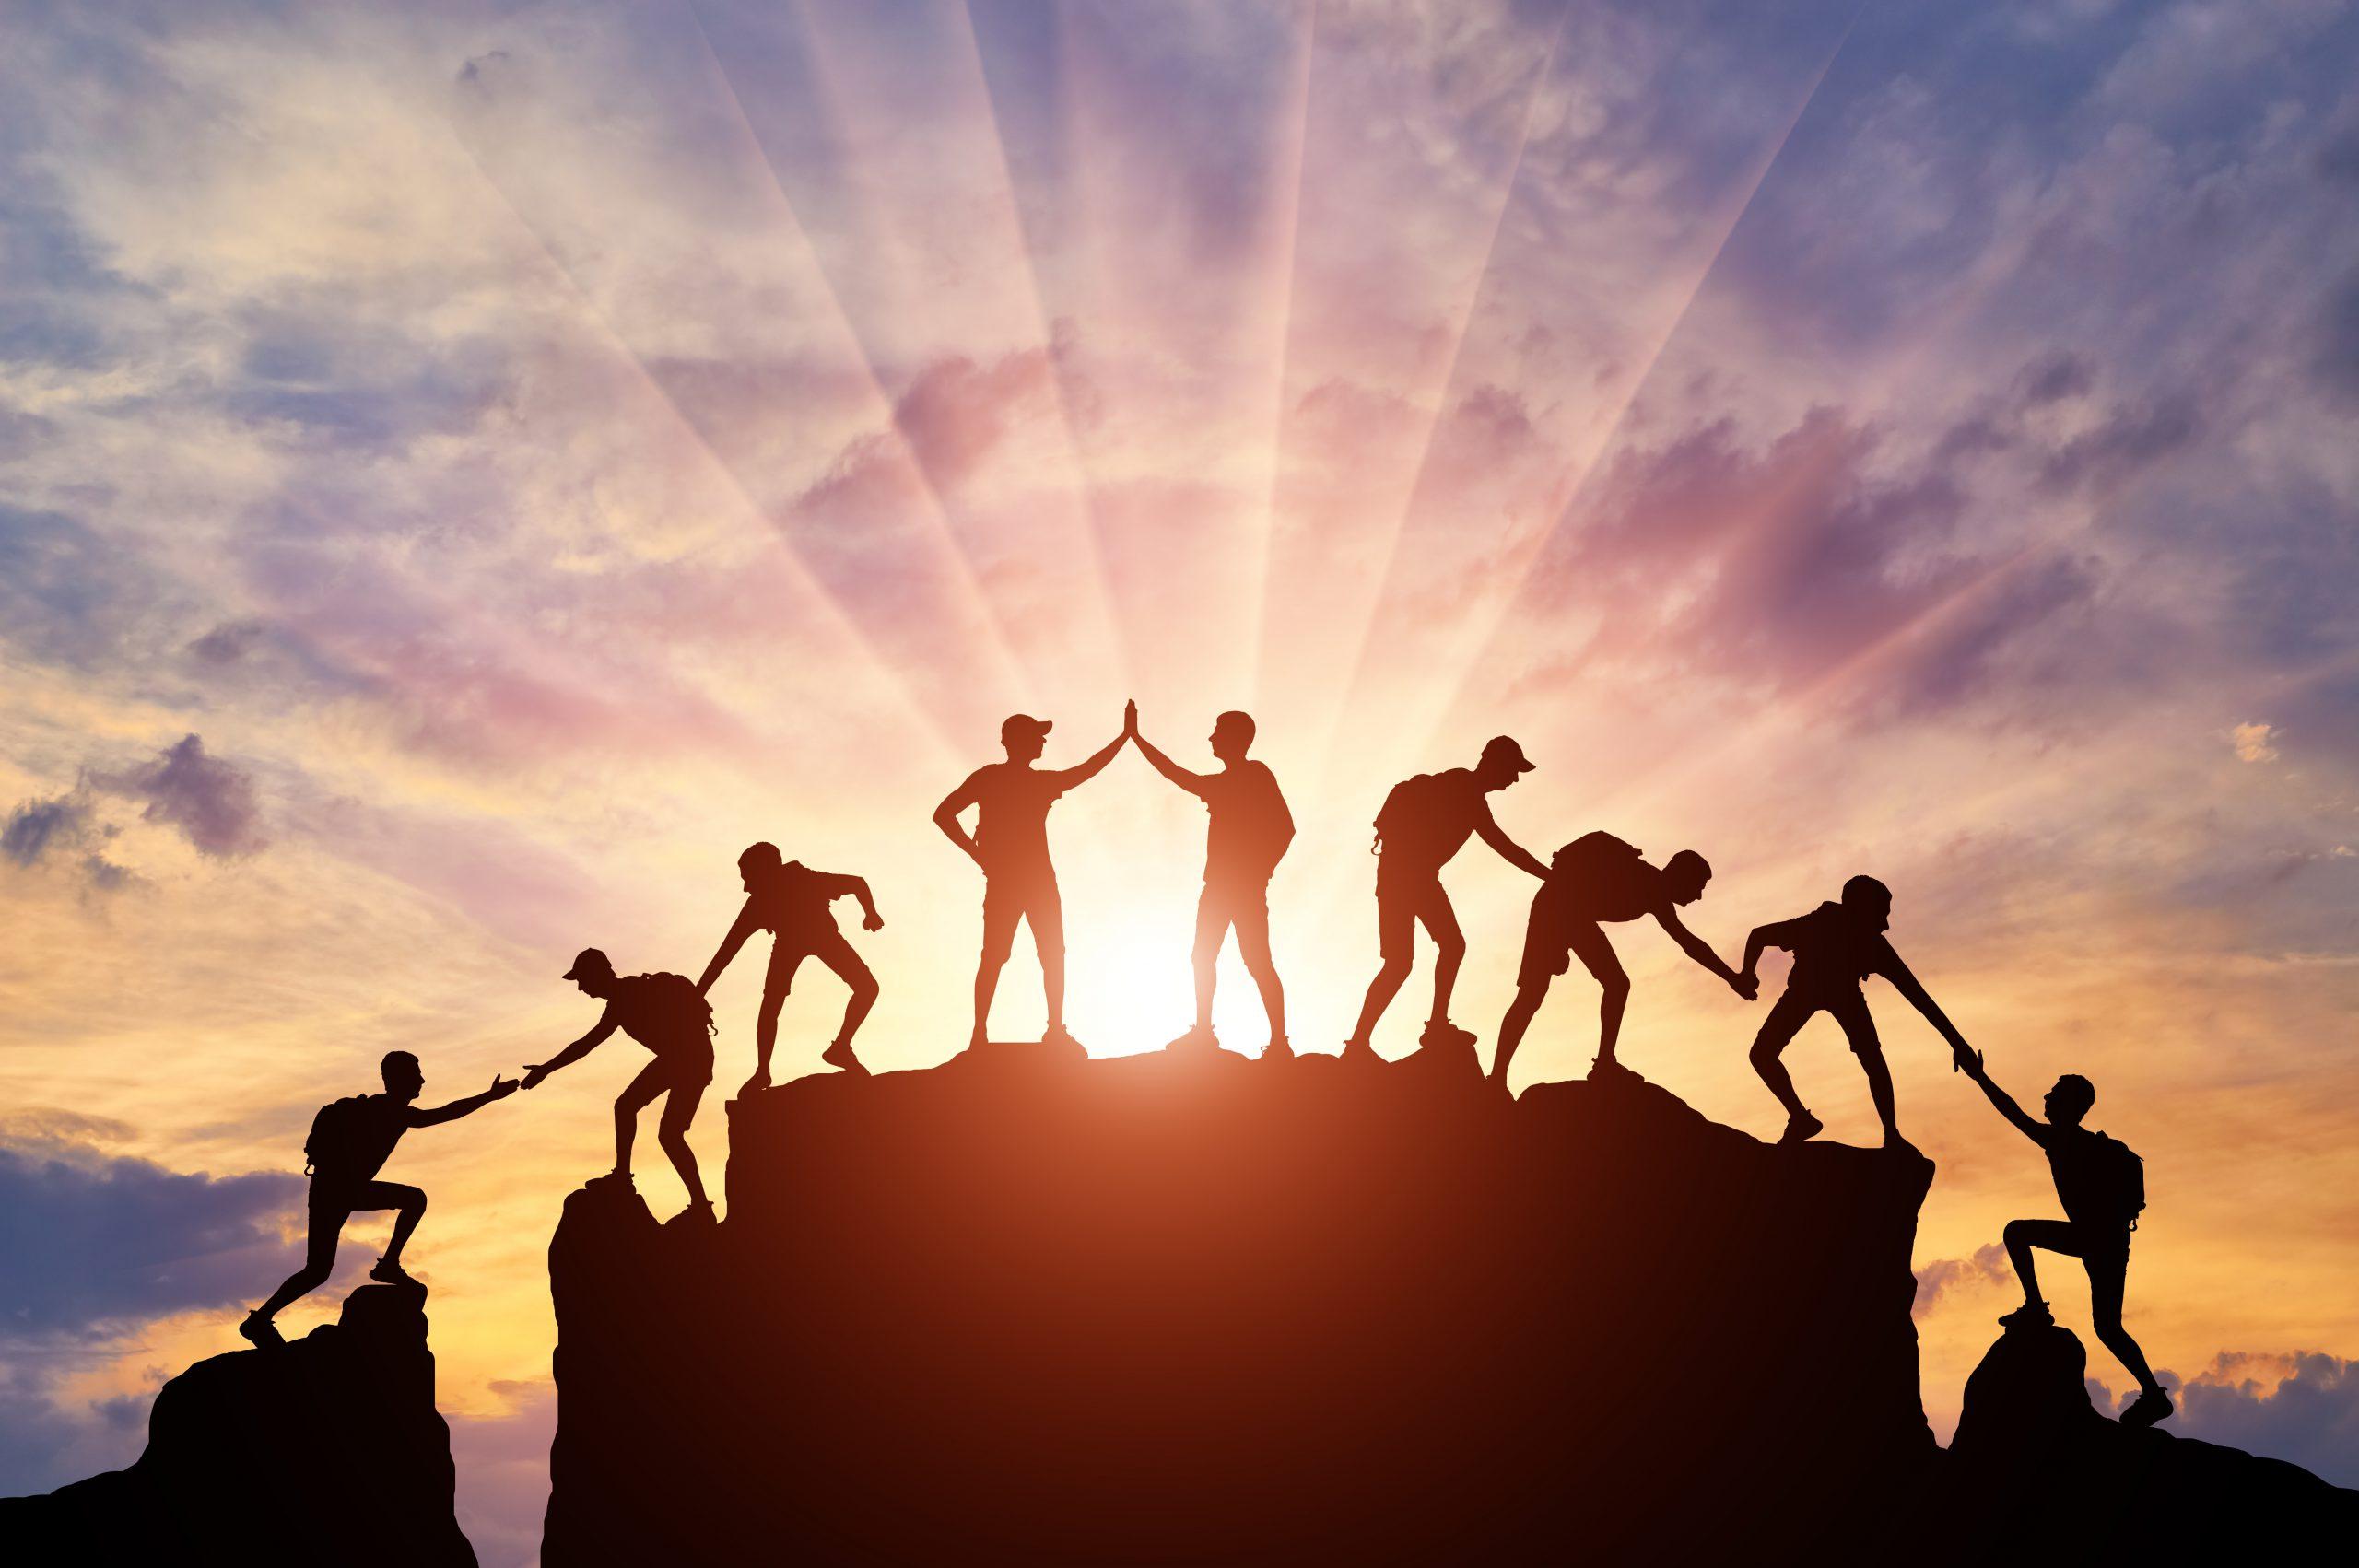 LI Group Core Values - Teamwork